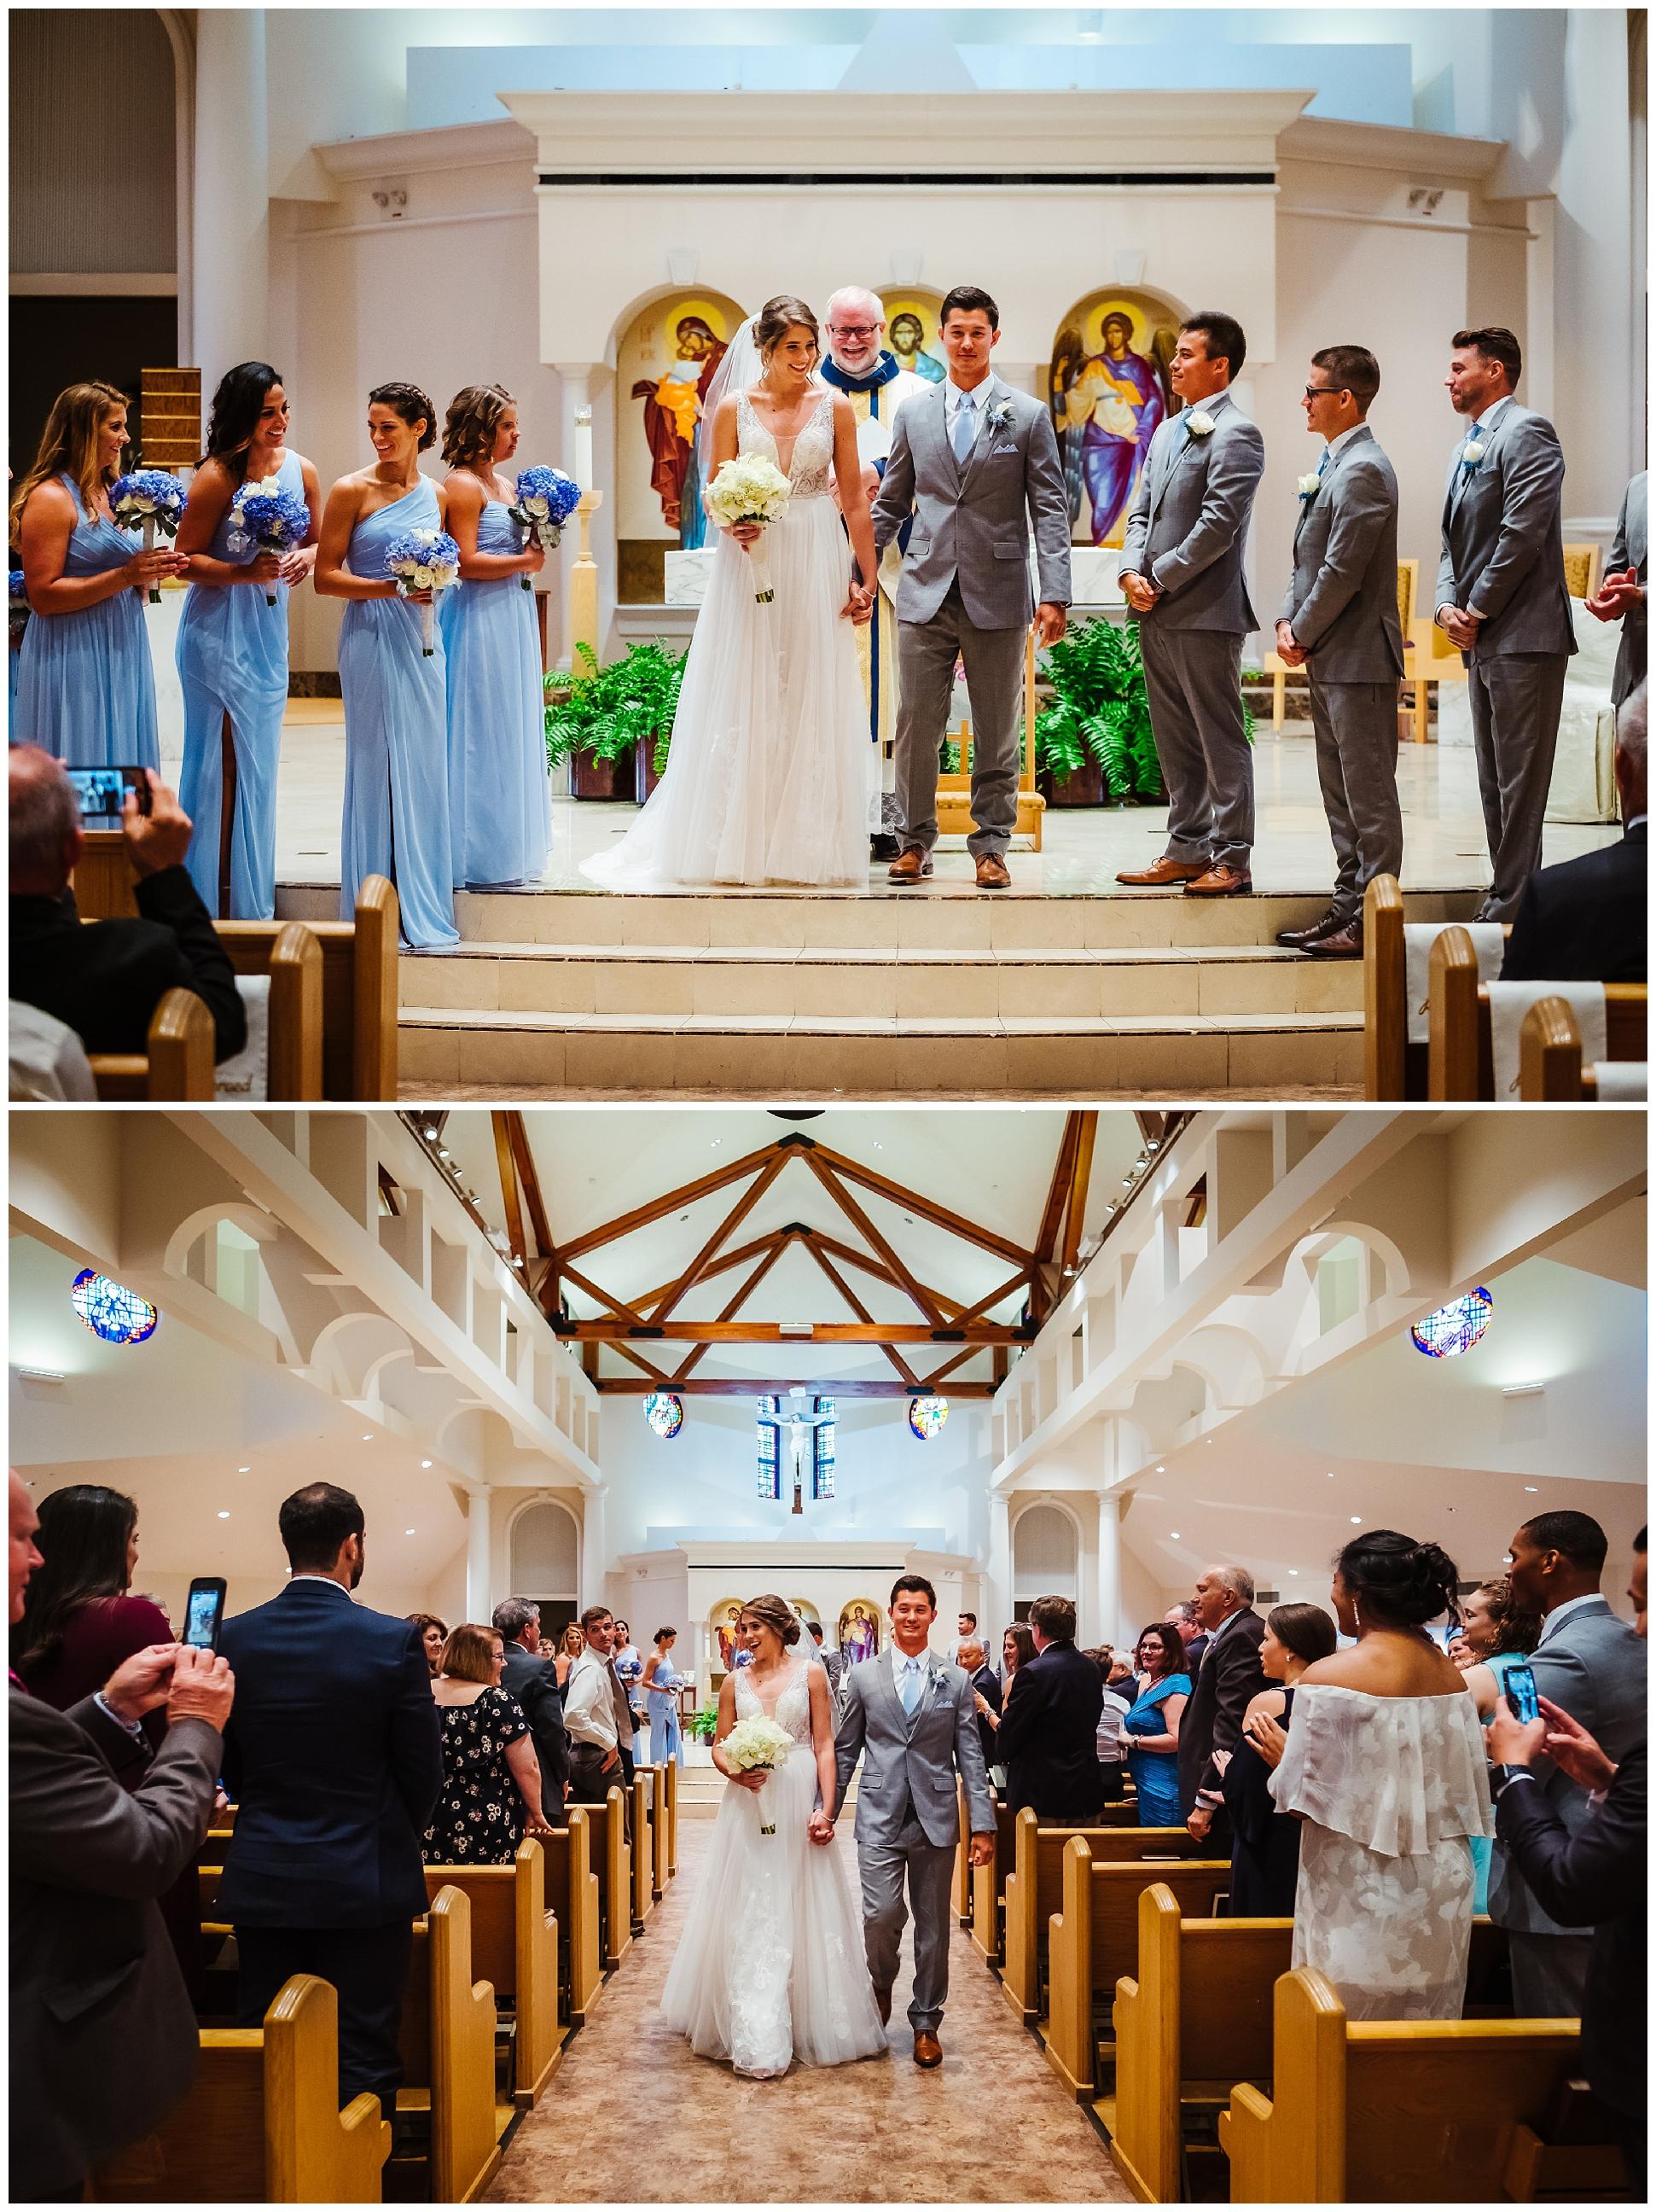 mahaffey-theater-big-military-wedding-st-pete-photographer-blue_0042.jpg